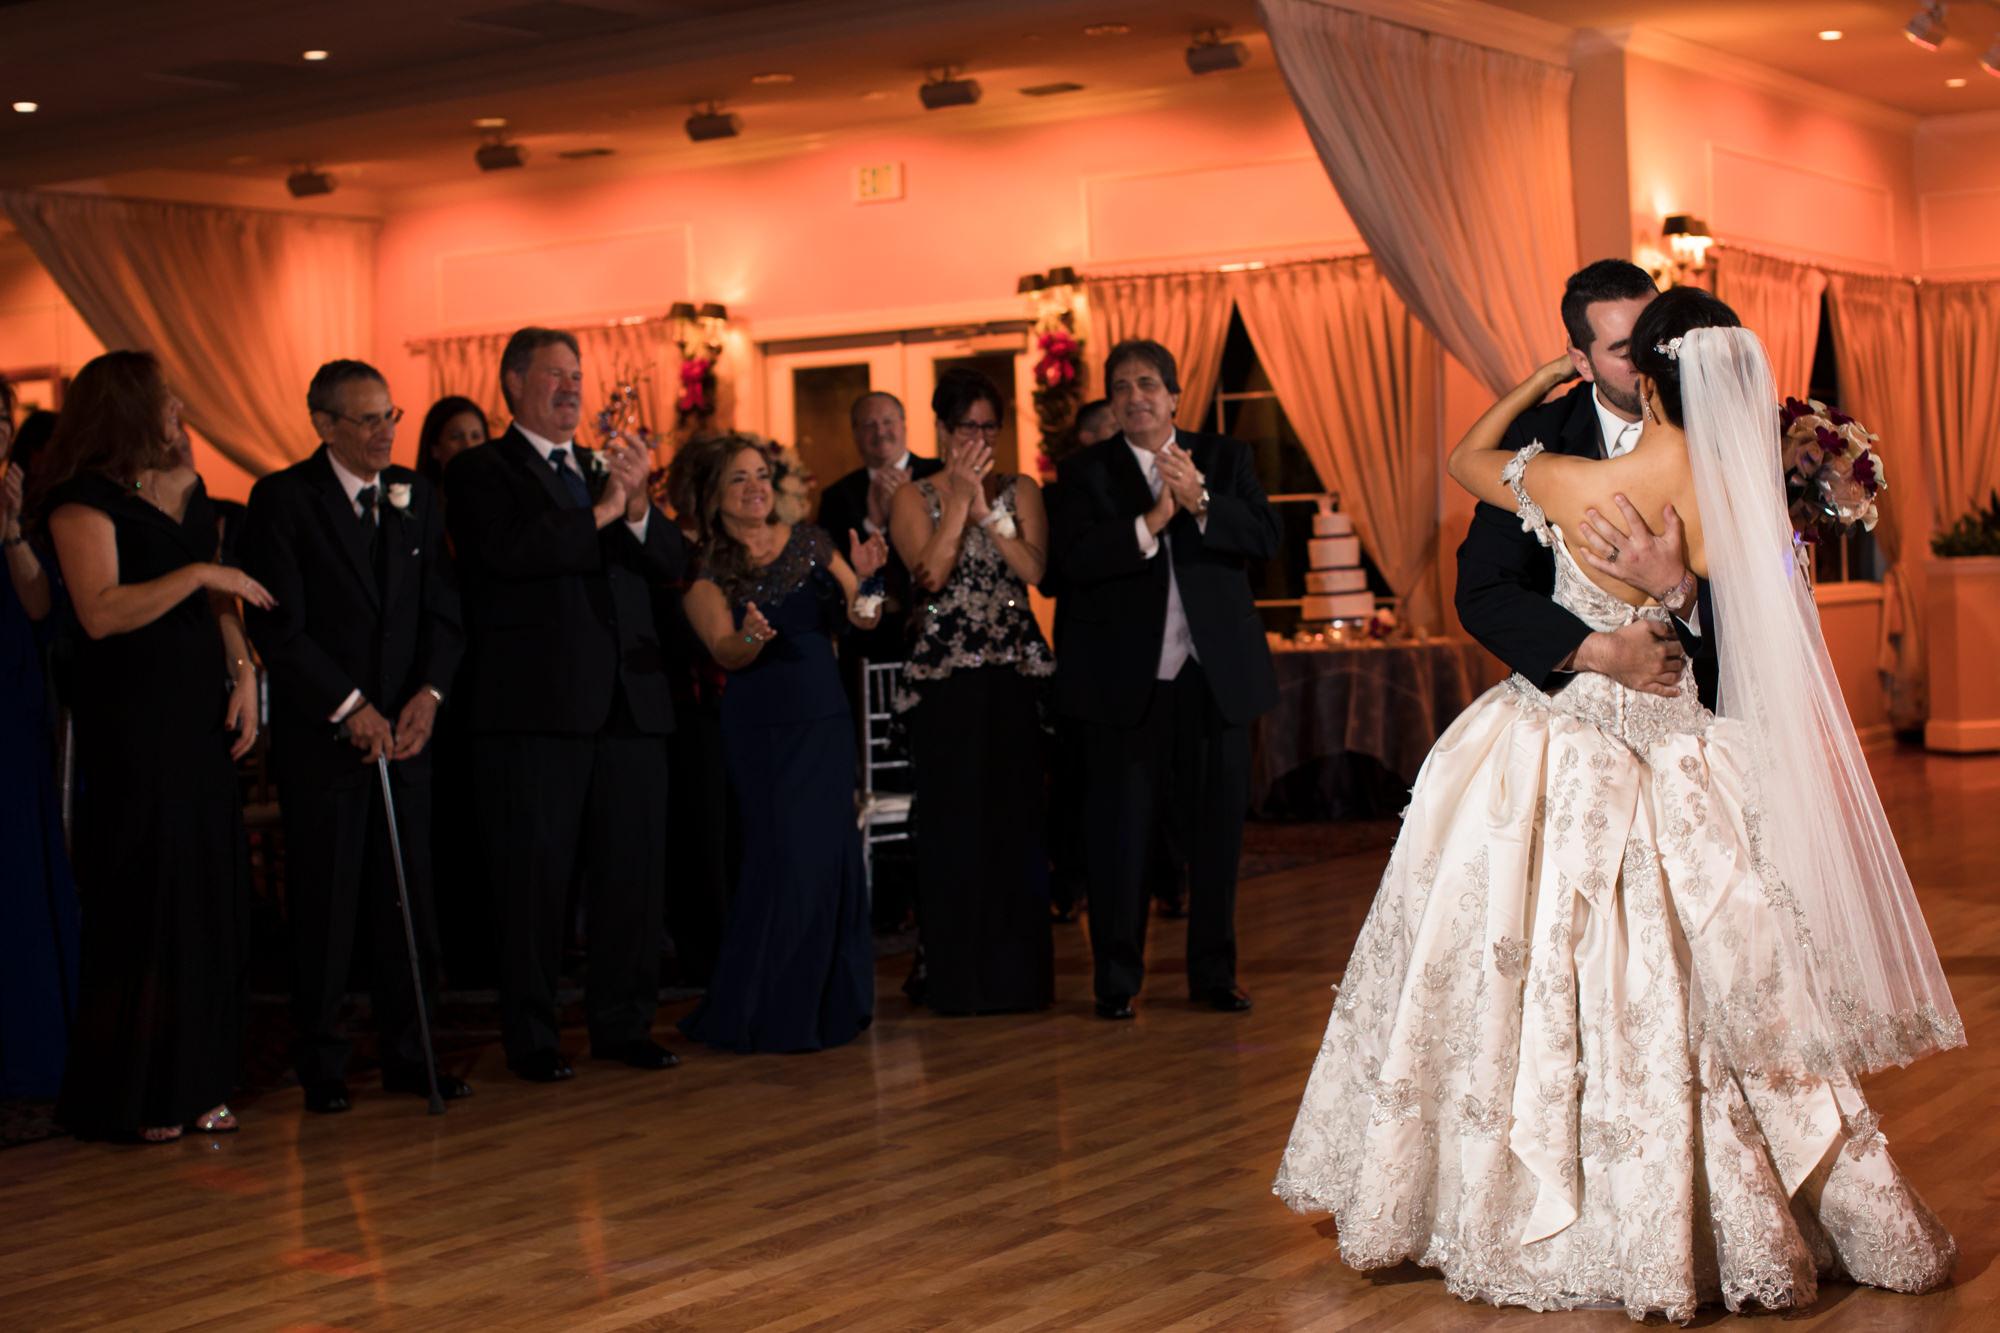 Benvenuto_Wedding_catholic_Florida_Bride-Groom-106.jpg